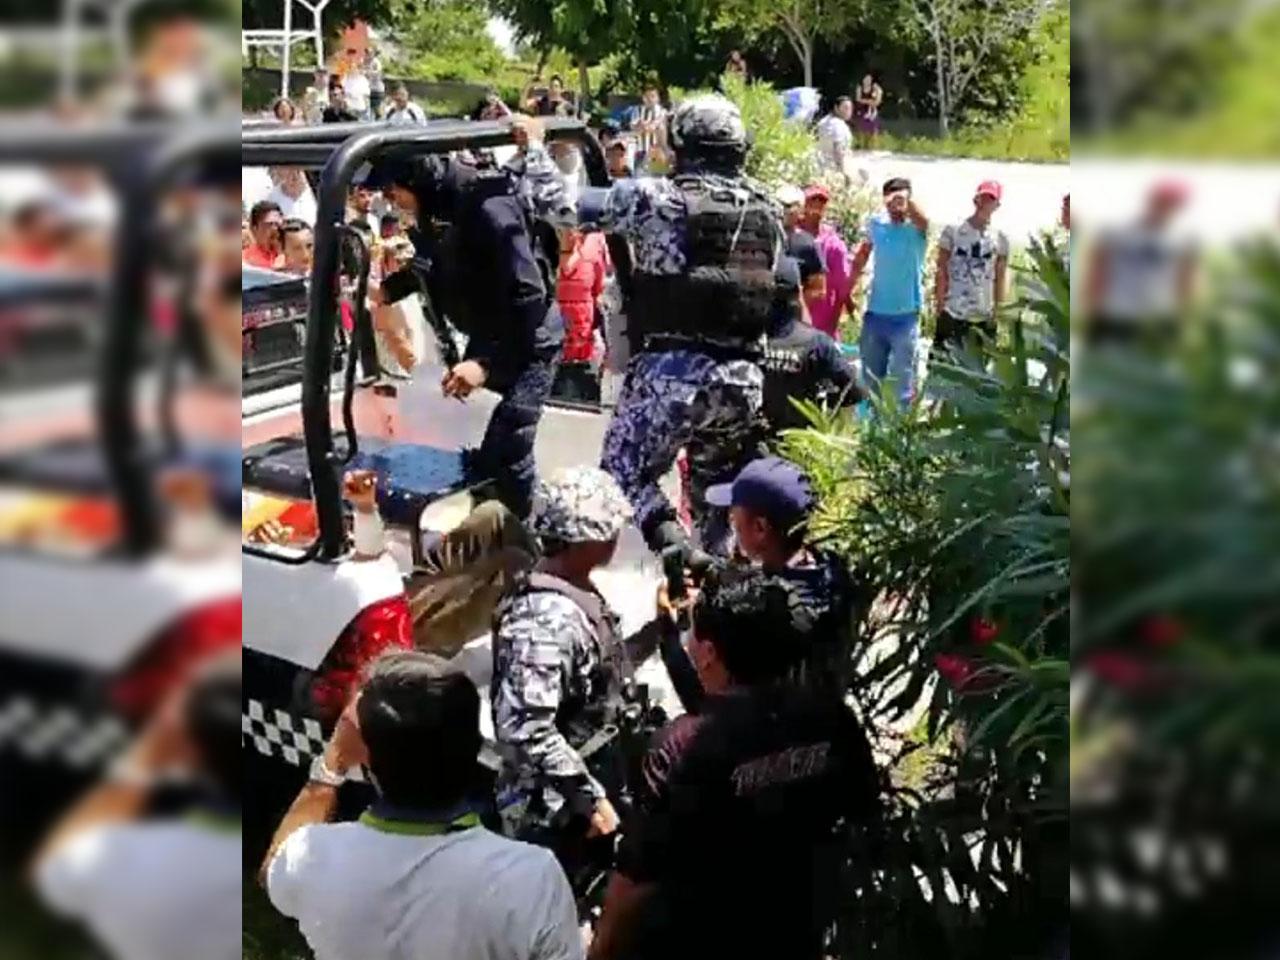 Riña acaba en tragedia, vecinos intentan linchar a detenidos